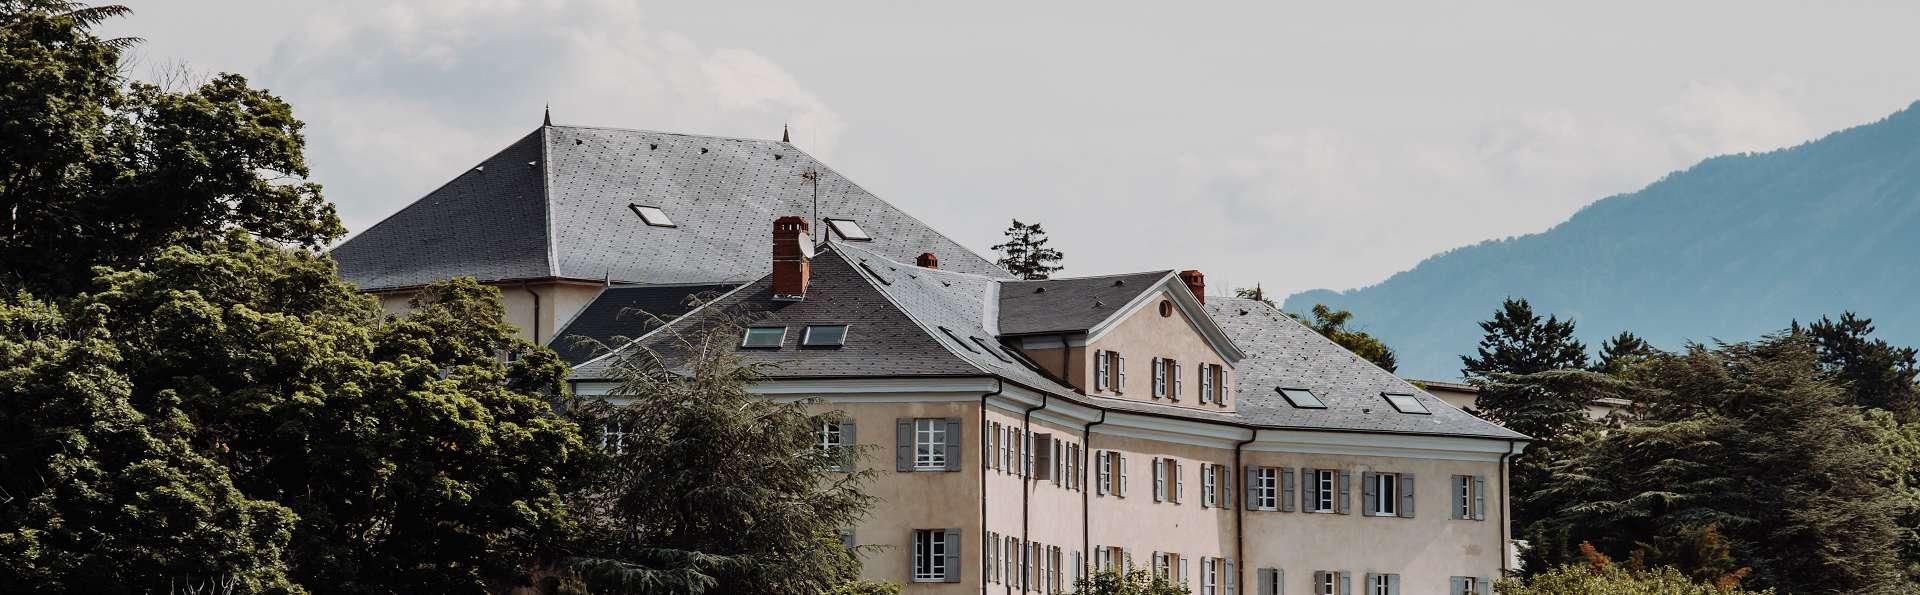 Hôtel la Robéyère, BW Signature Collection by Best Western - CMP-ROBEYERE-SPA-06-2021-2.jpg